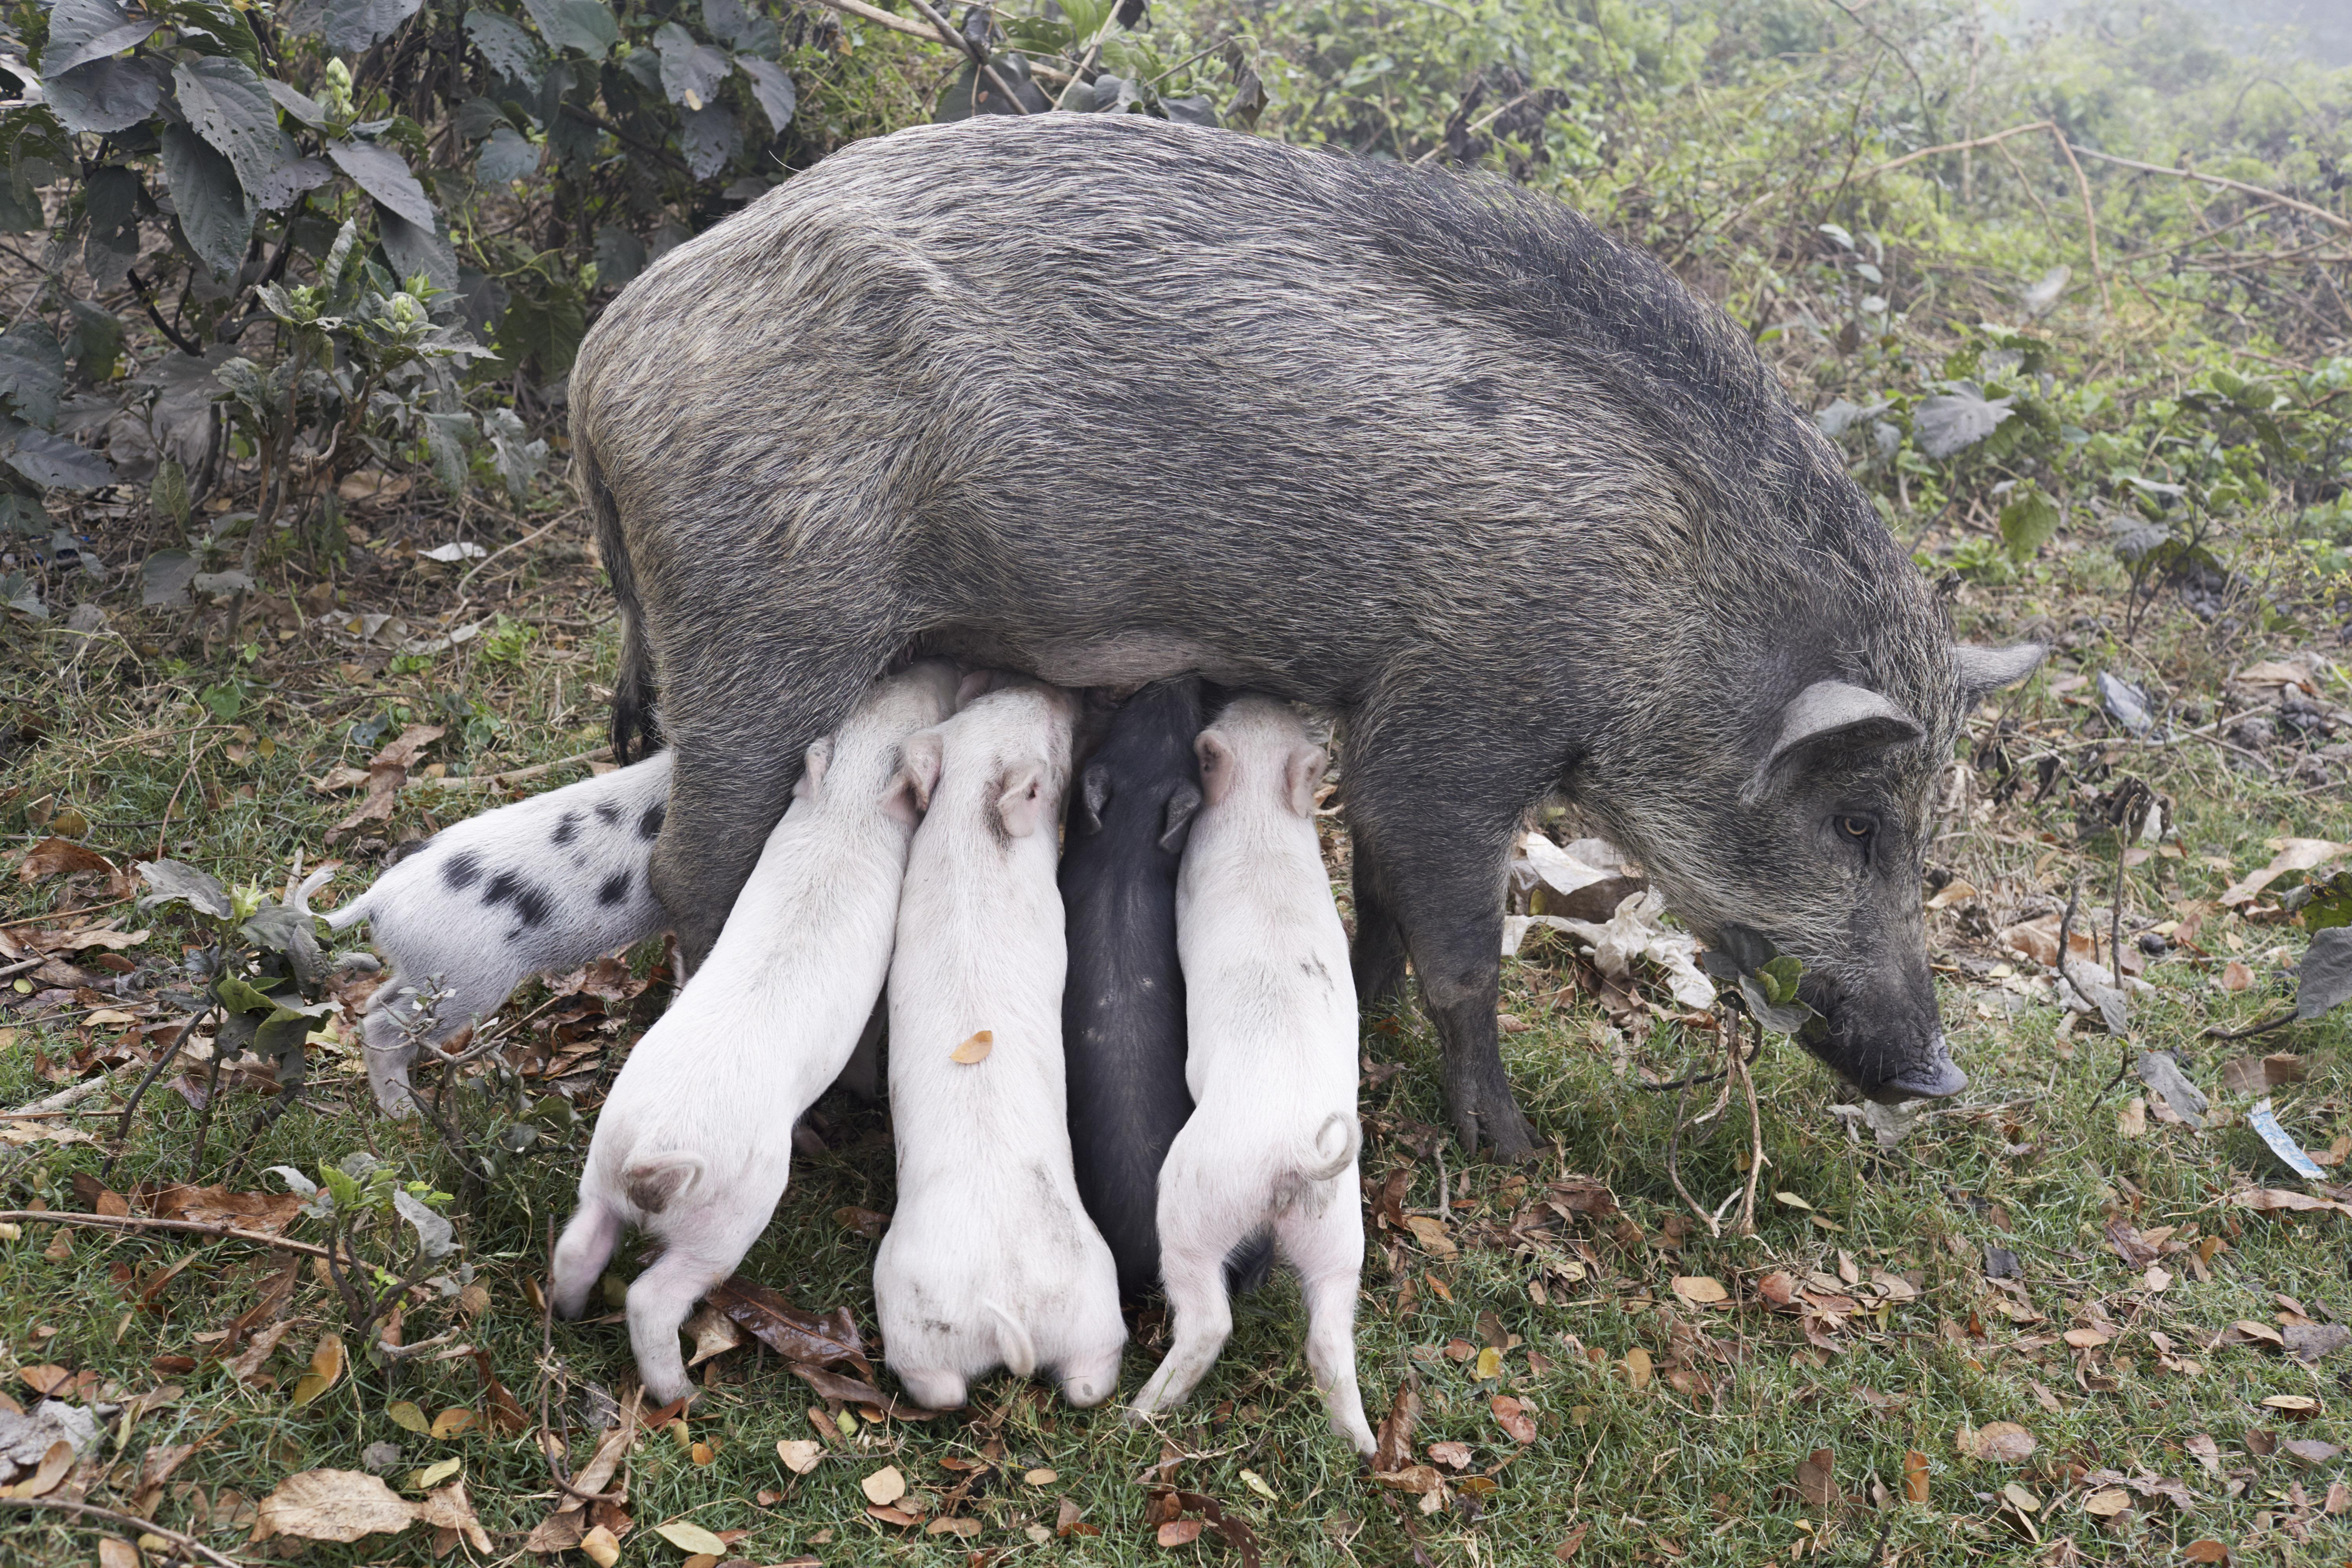 Wildschweinmutter, Kolkata, India 2014.